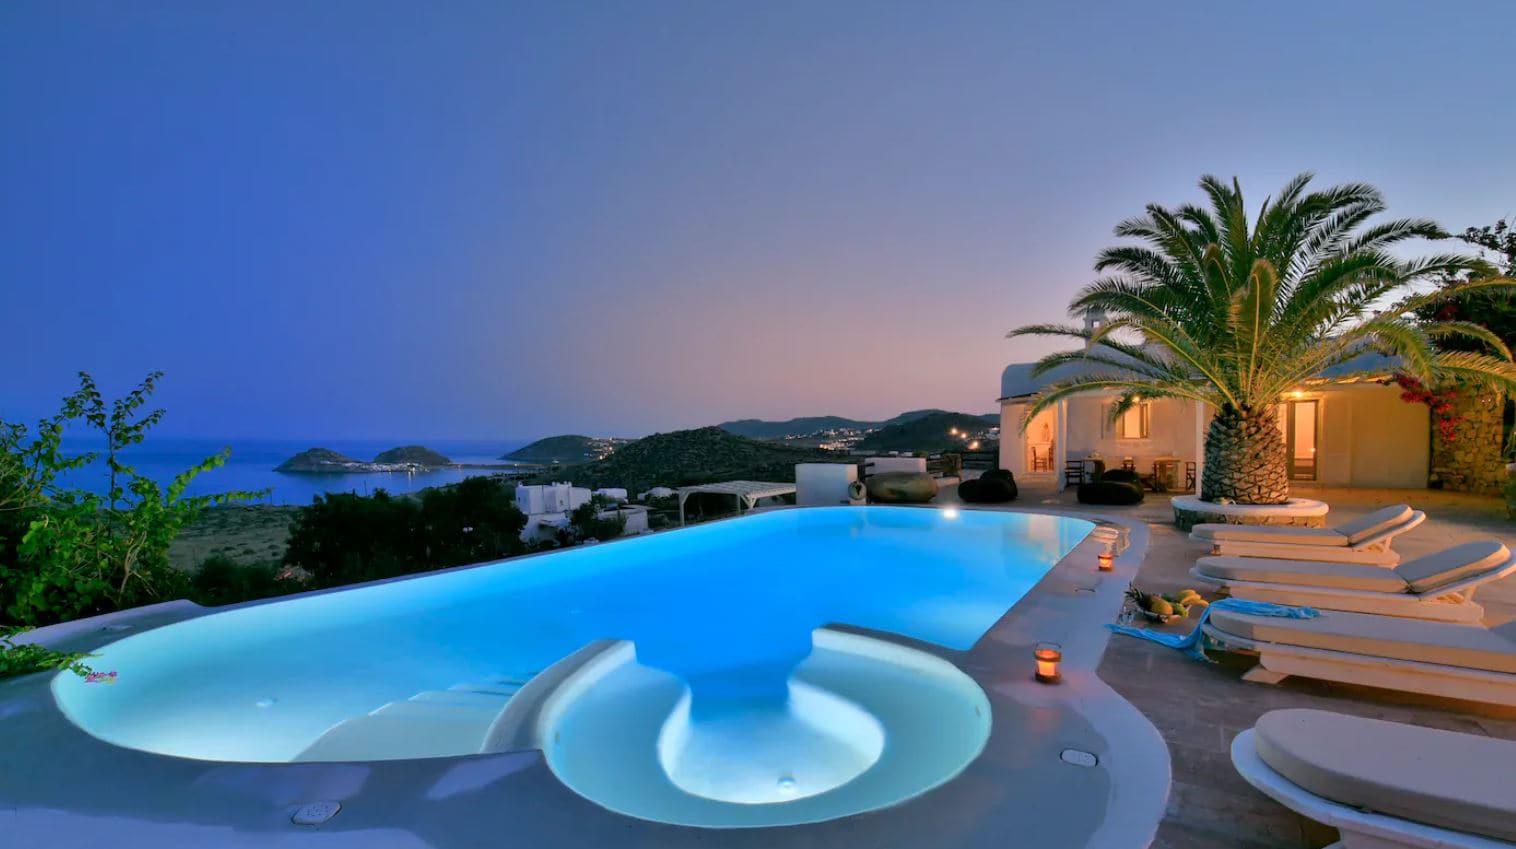 8. Extraordinary Mykonos Airbnb With Infinity Pool